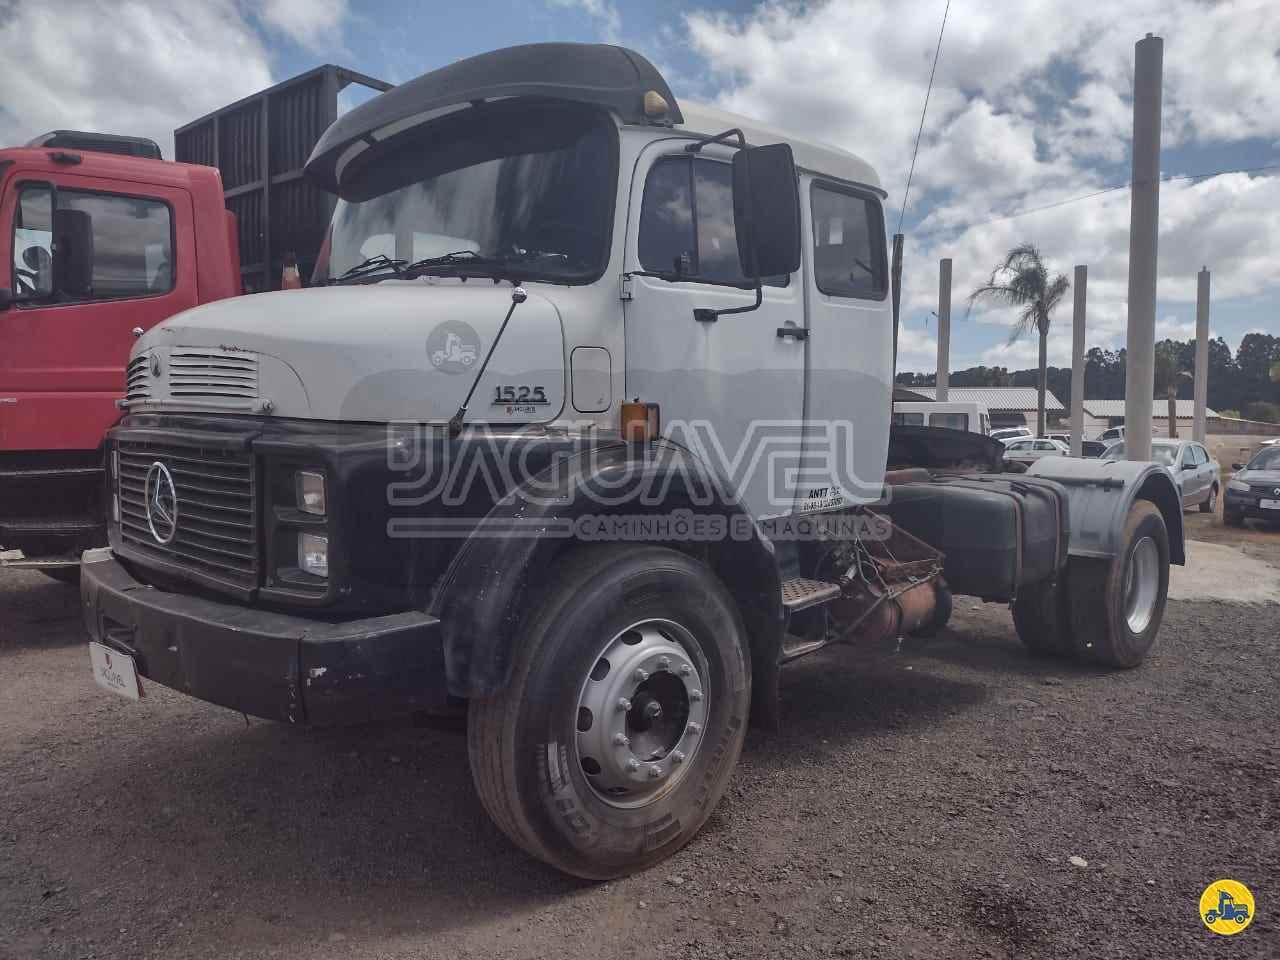 CAMINHAO MERCEDES-BENZ MB 1525 Cavalo Mecânico Truck 6x2 Jaguavel Caminhões JAGUARIAIVA PARANÁ PR